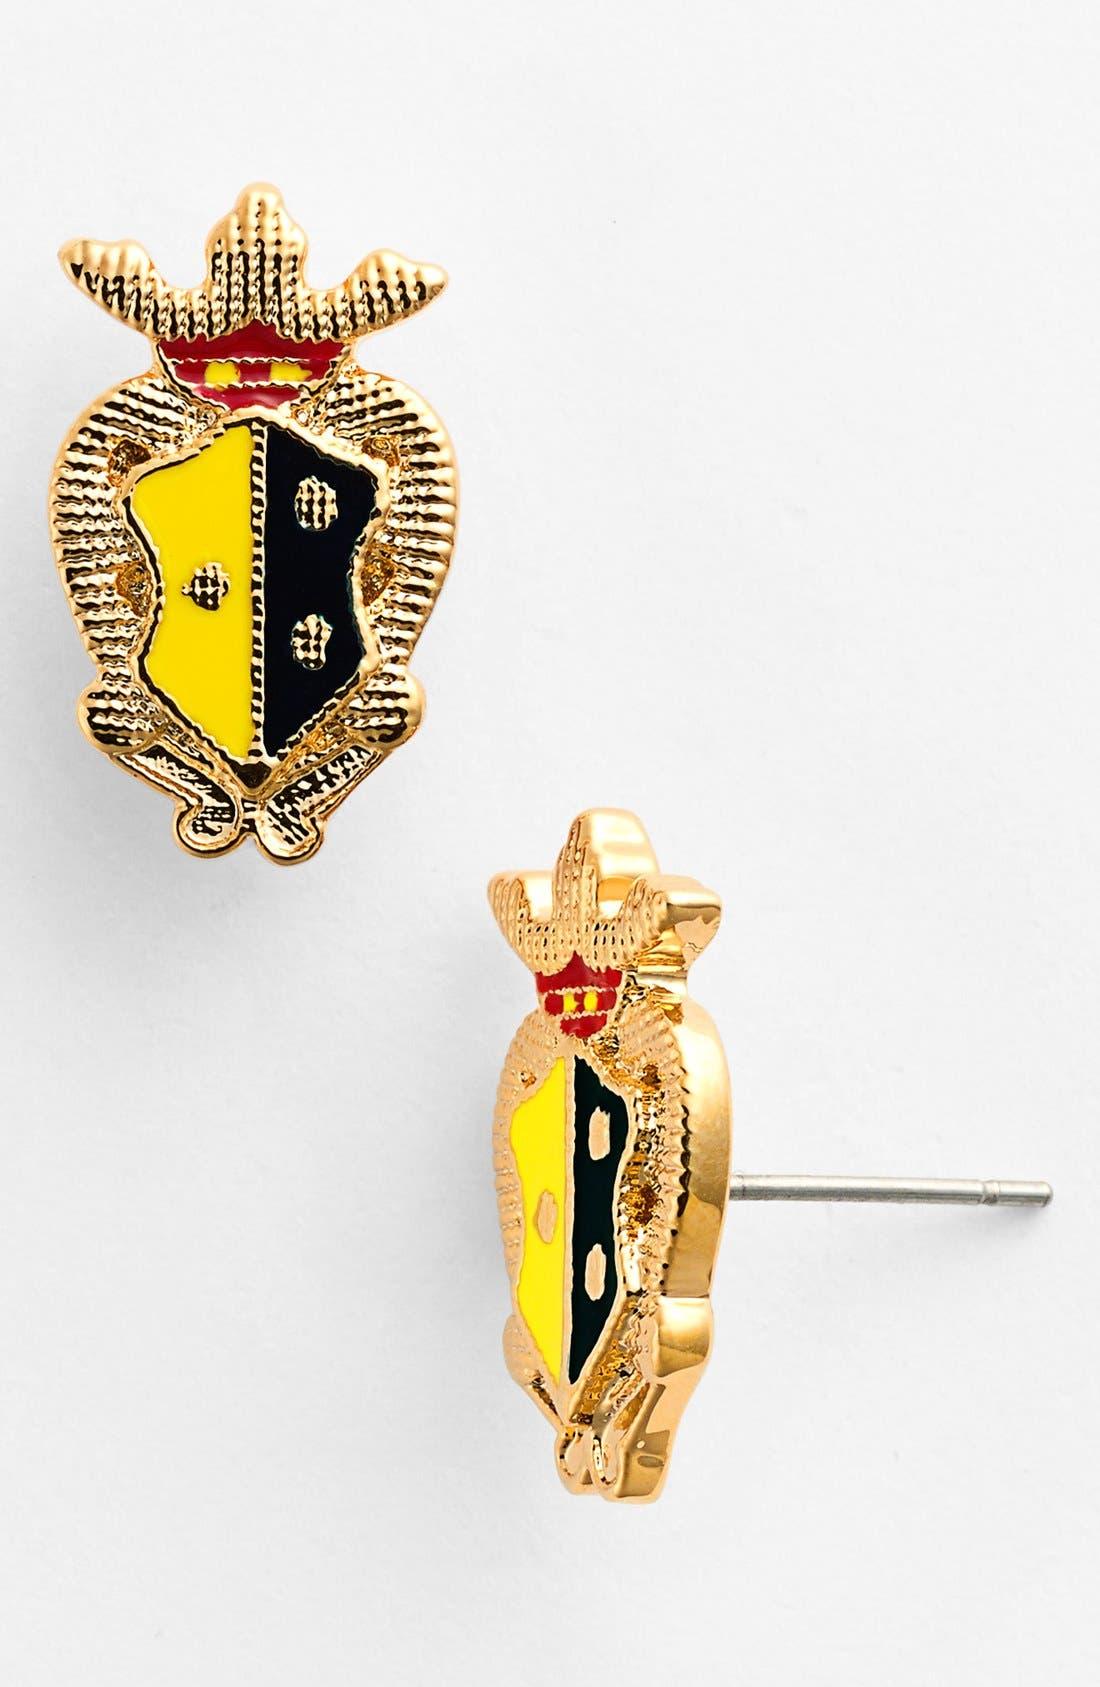 Main Image - Tory Burch 'Dellora' Stud Earrings